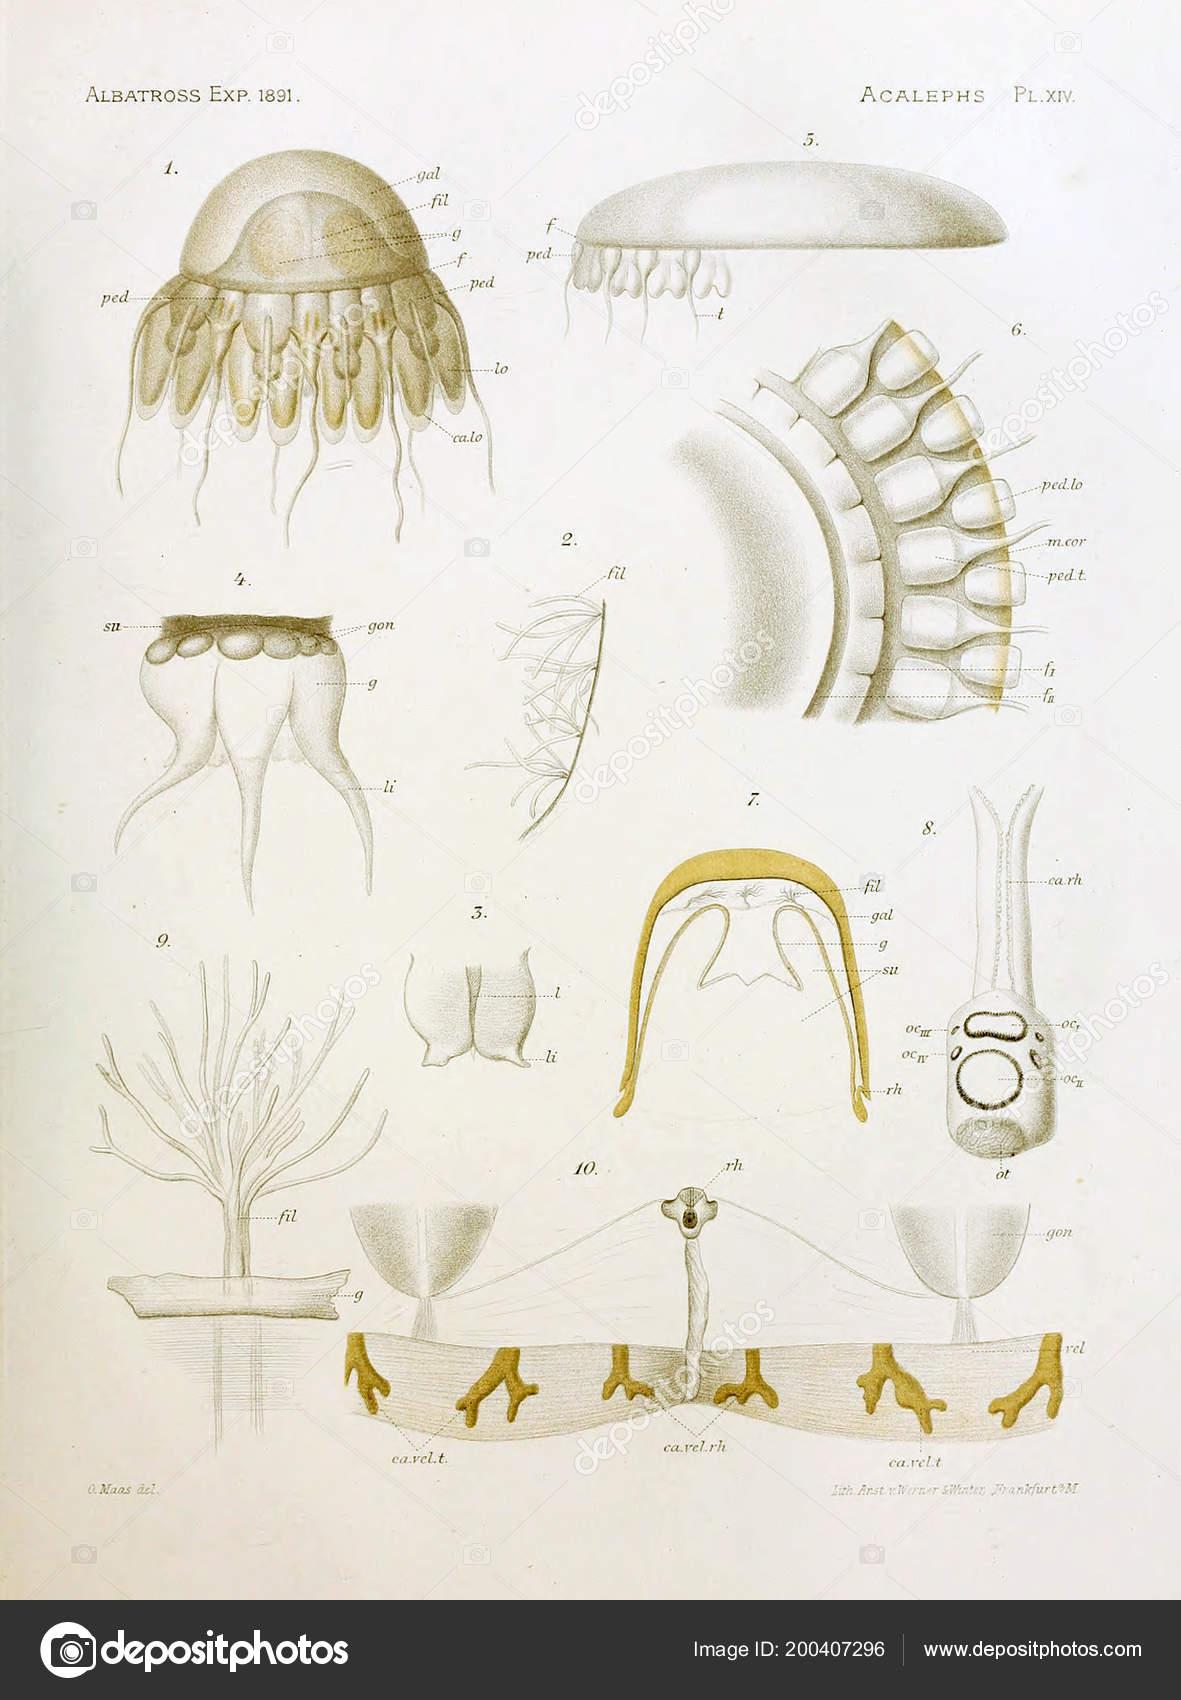 Illustration Anatomy Jellyfish — Stock Photo © ruskpp #200407296